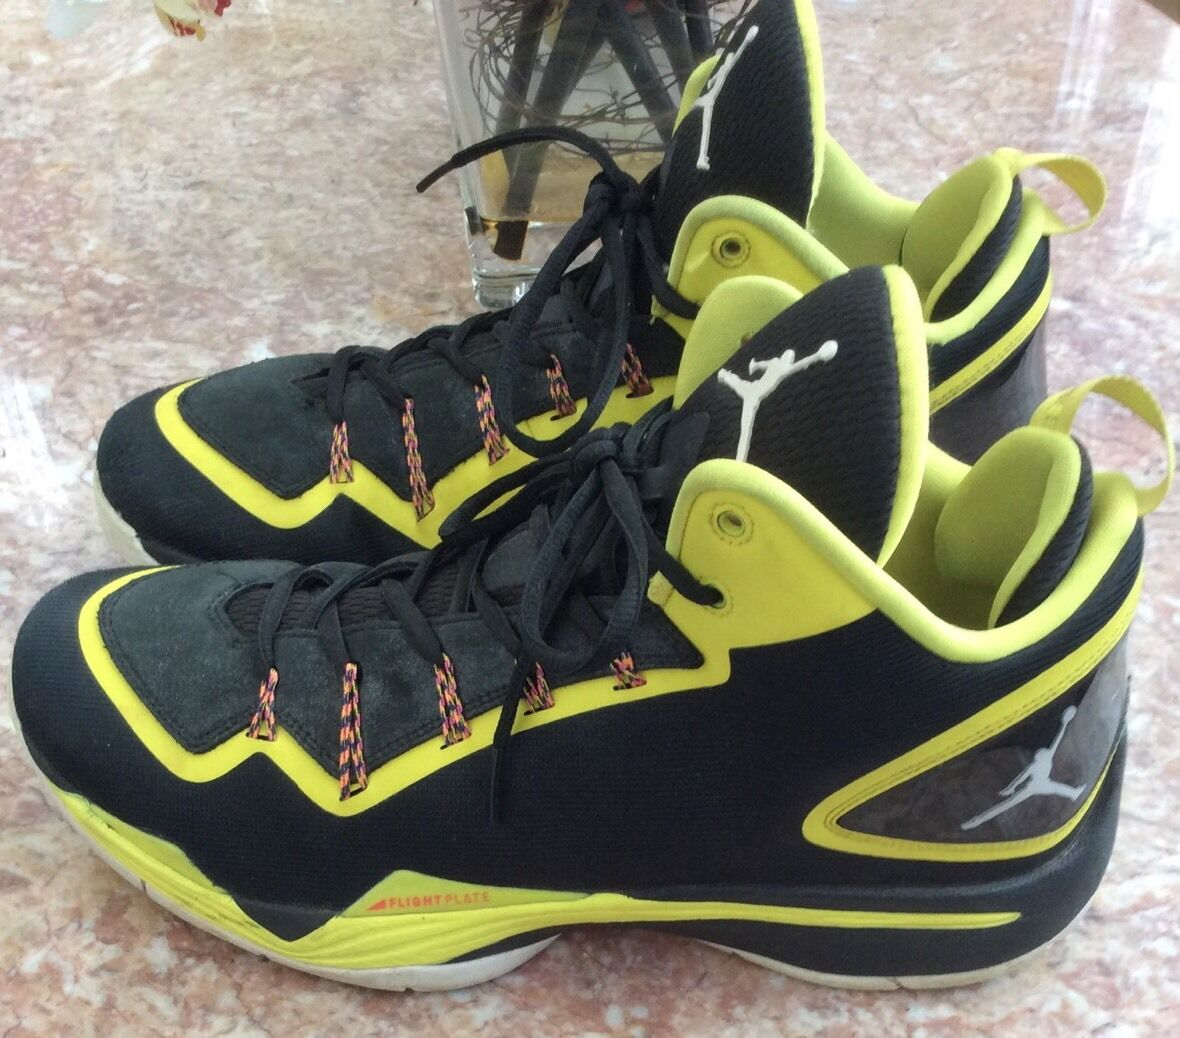 Nike Jordan Super Fly 2 PO Men Black Yellow Basketball shoes Sz 11.5 645058-070